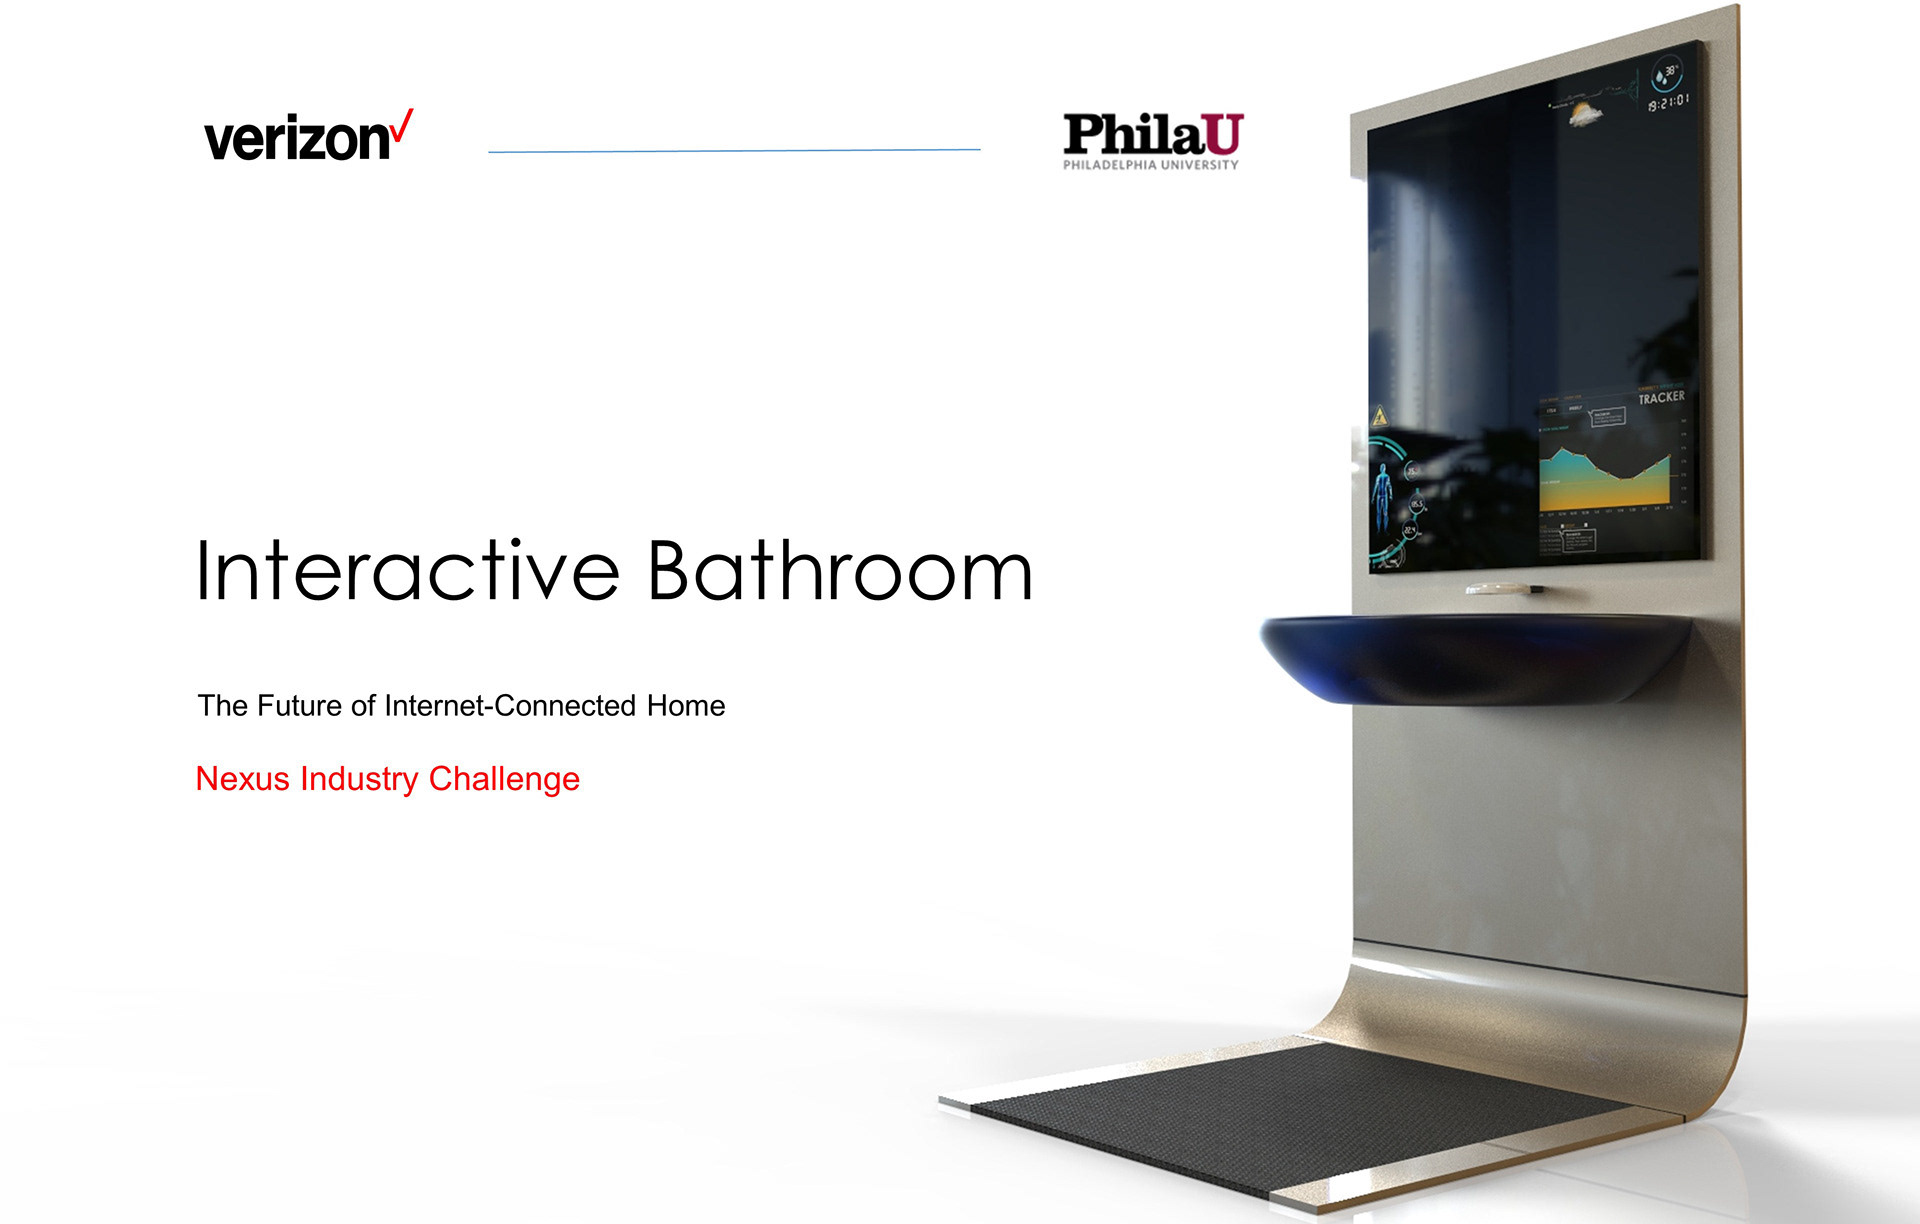 satej koli - Interactive Bathroom